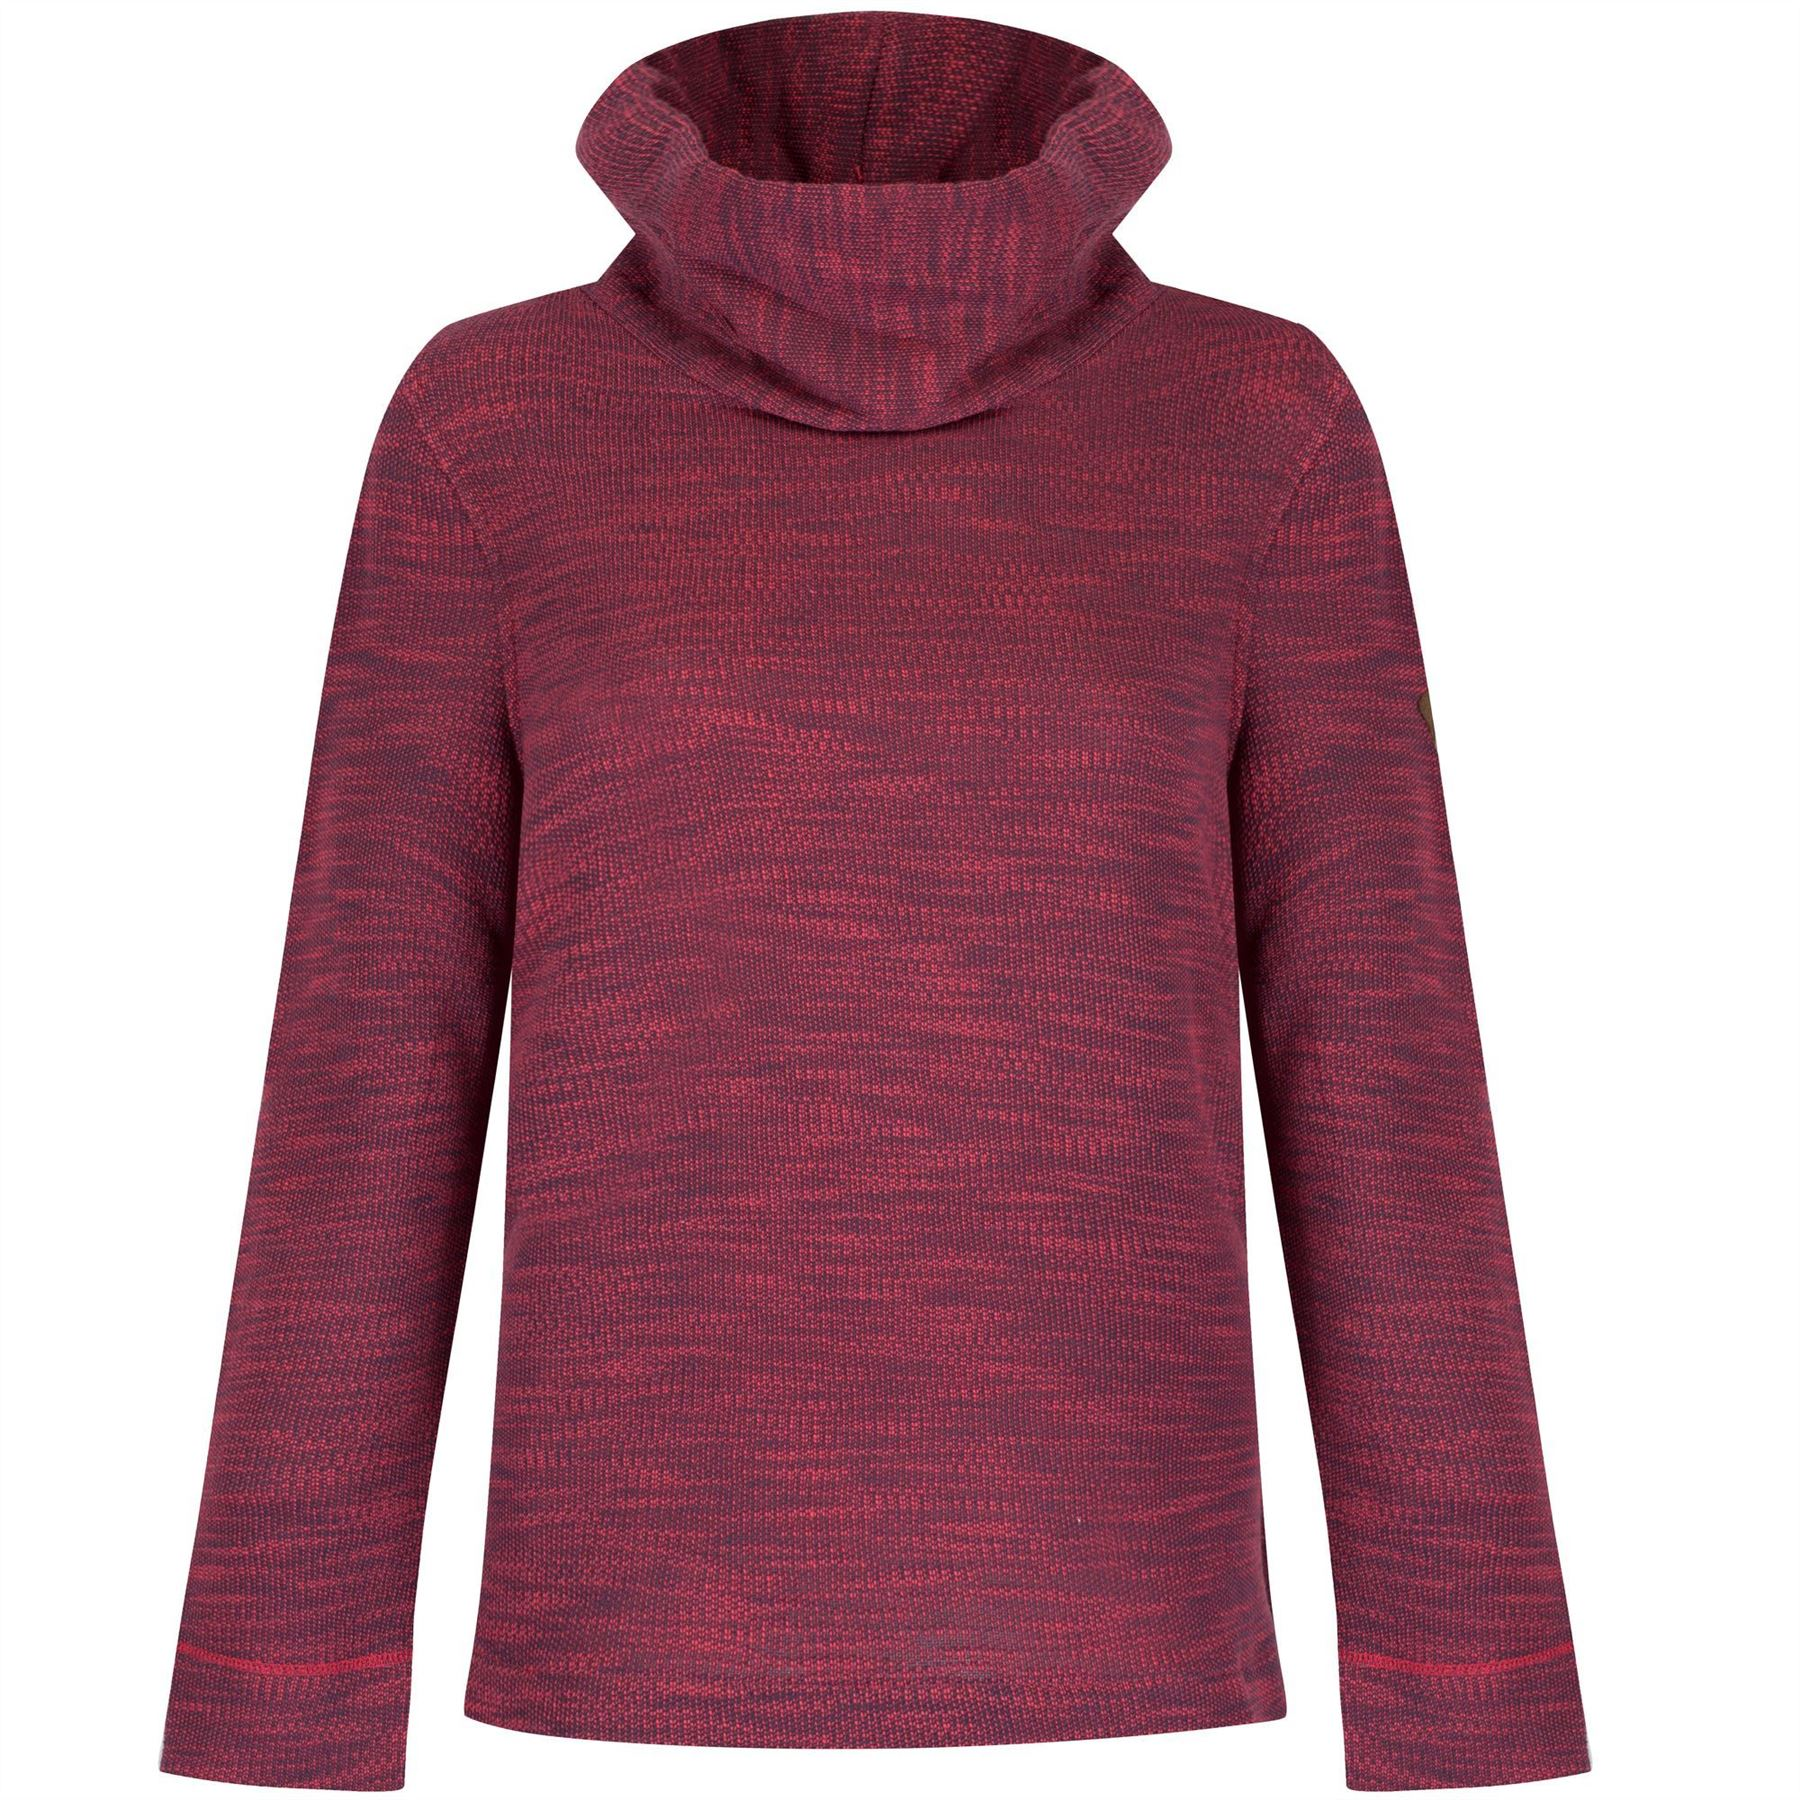 Regatta-Ceanna-Cowl-Neck-Soft-Fleece-Pull-Over-Jumper-Sweater-Top-RWA276 thumbnail 12